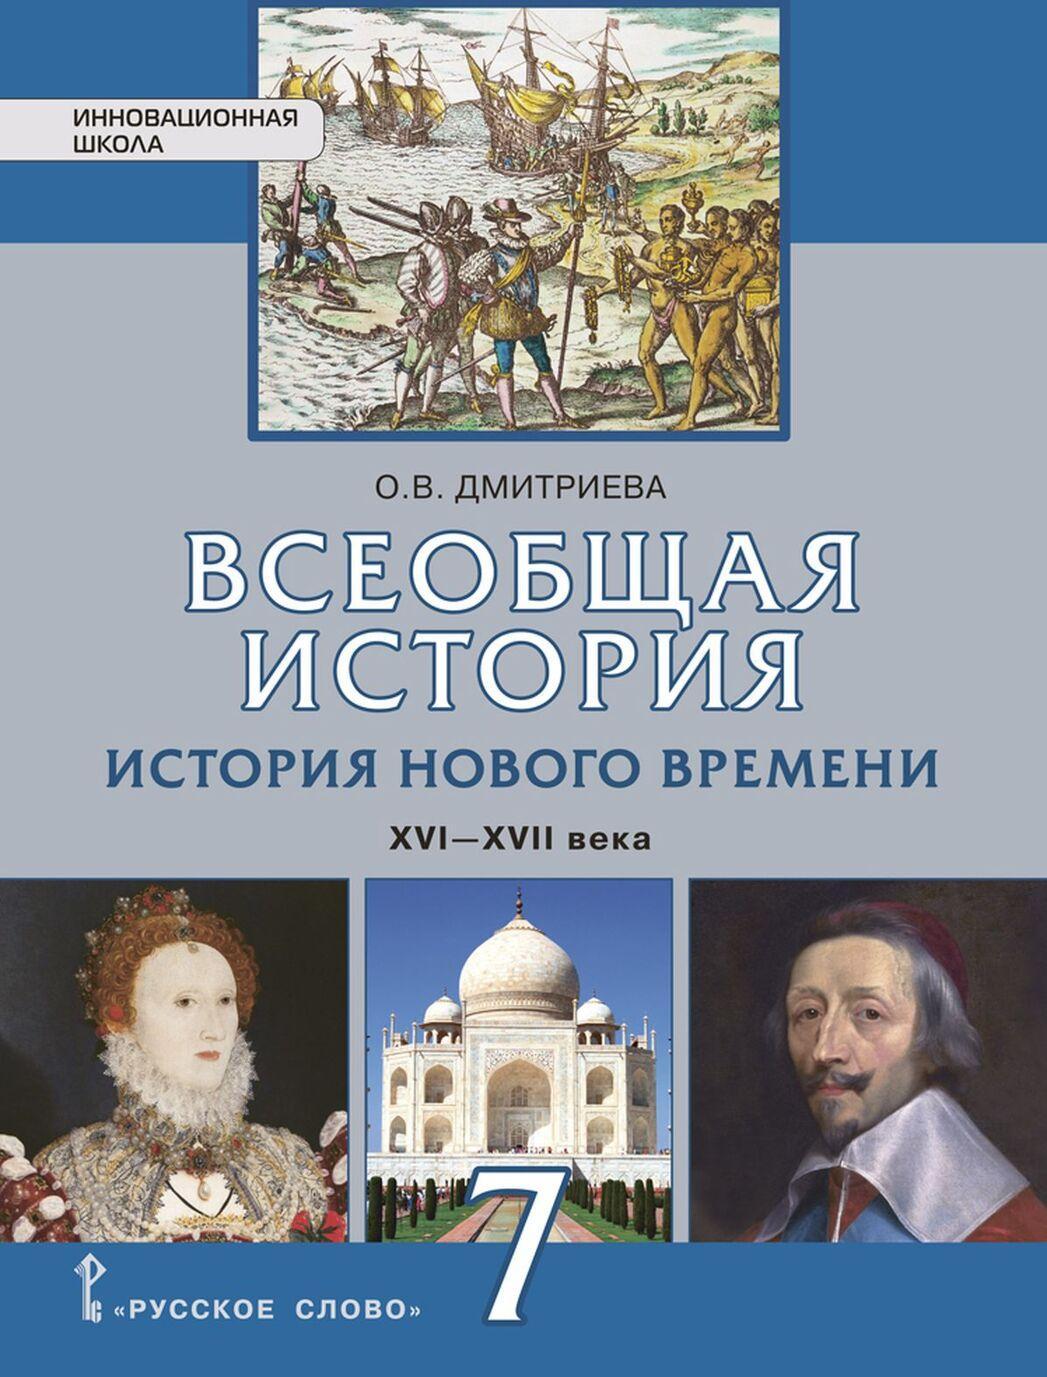 Vseobschaja istorija. Istorija Novogo vremeni. Konets XV - XVII vek. Uchebnik. 7 klass